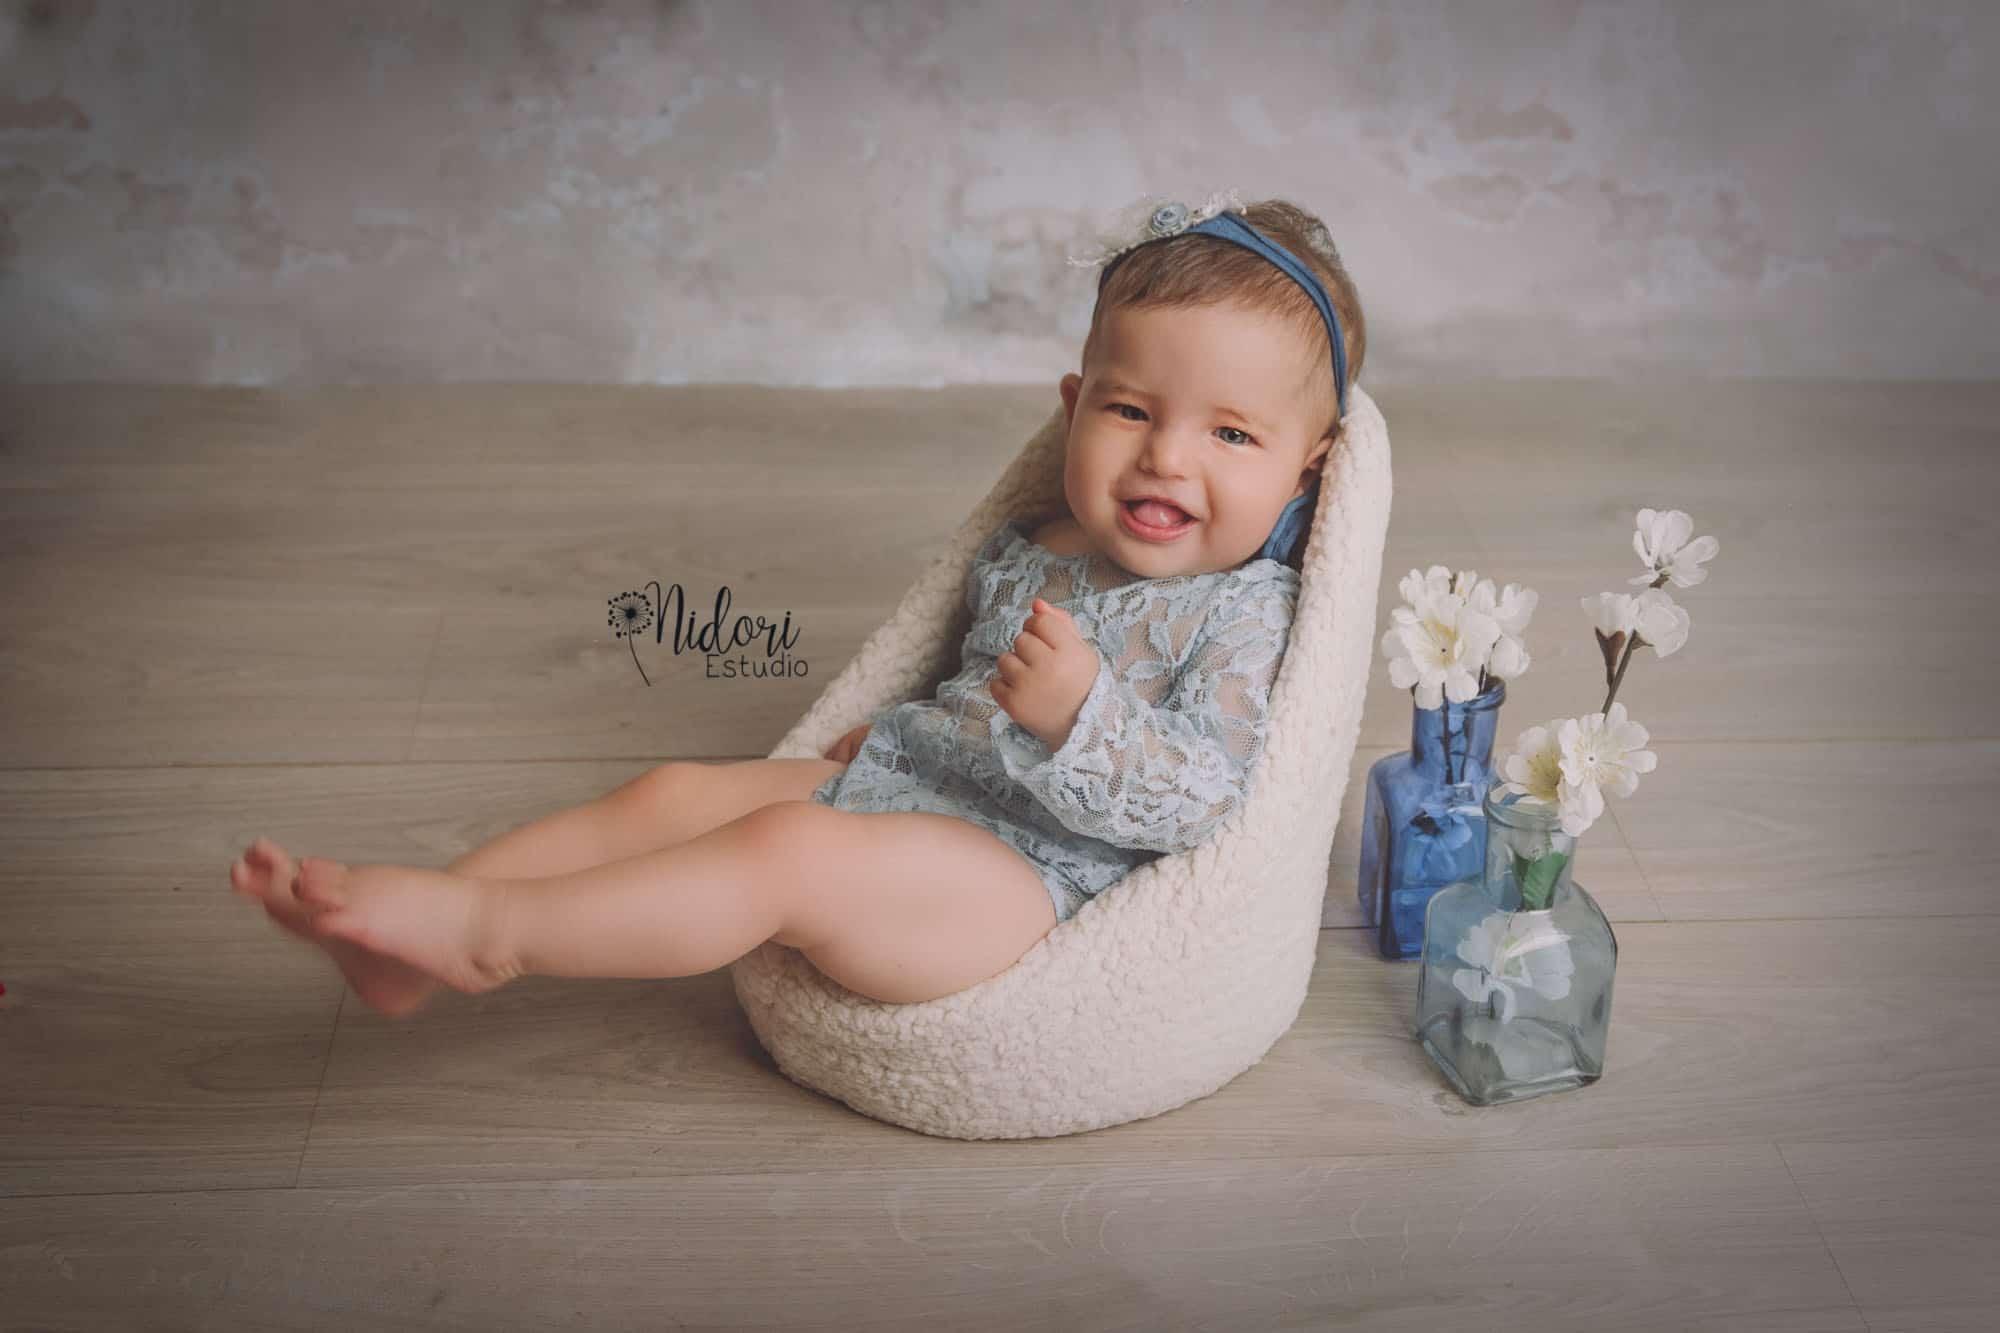 seguimiento-fotografia-niños-bebes-nidoriestudio-fotos-valencia-almazora-castellon-españa-spain-13